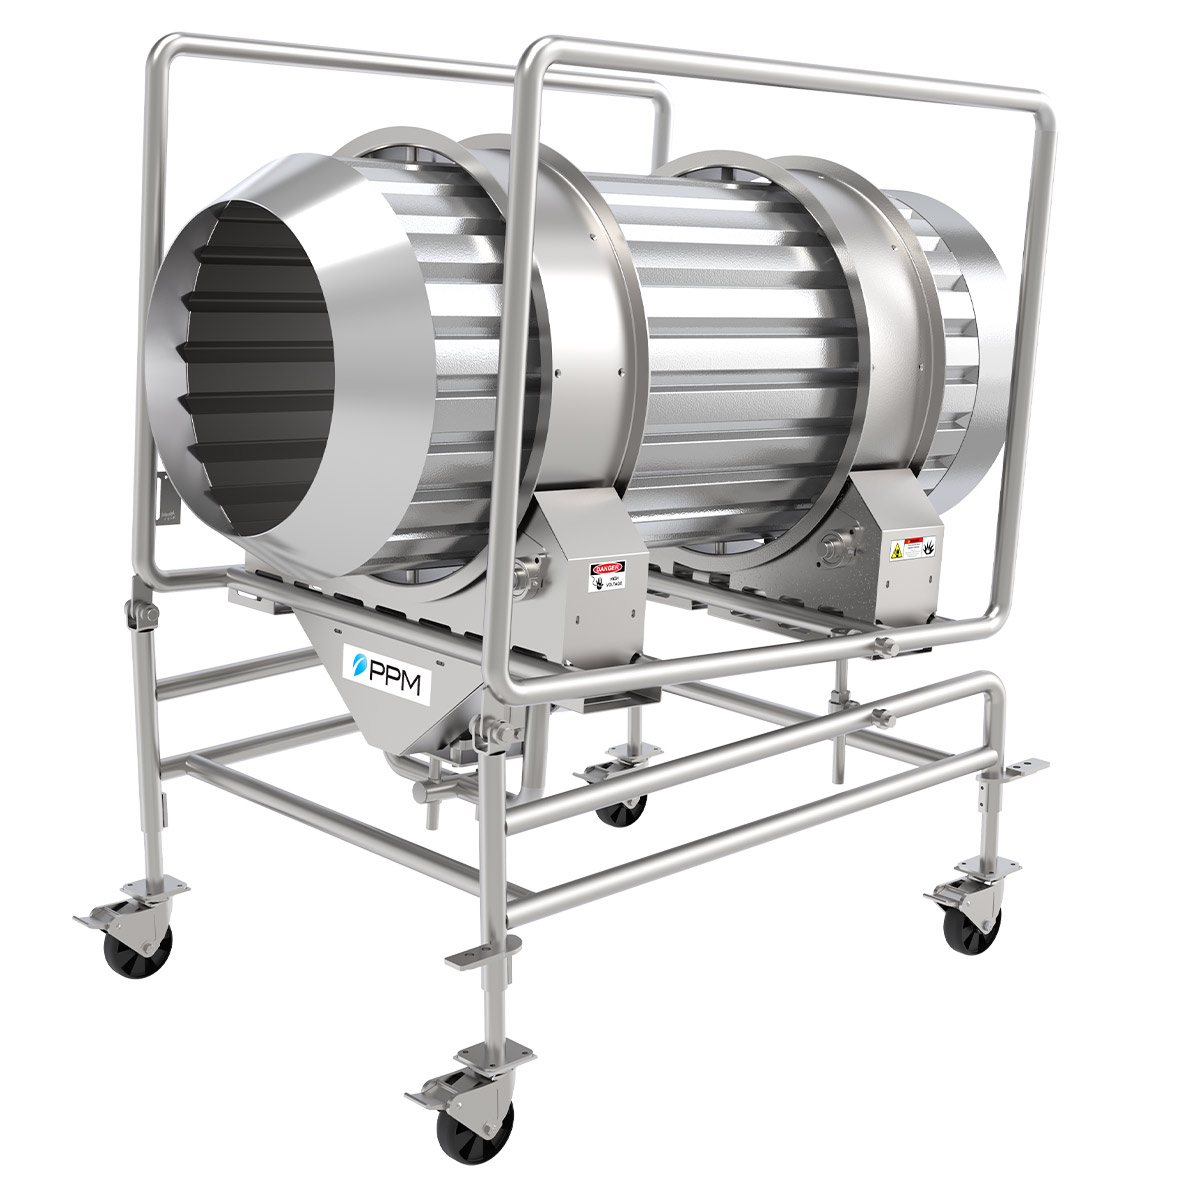 PPM Technologies - stainless steel seasoning and coating drum cradle frame